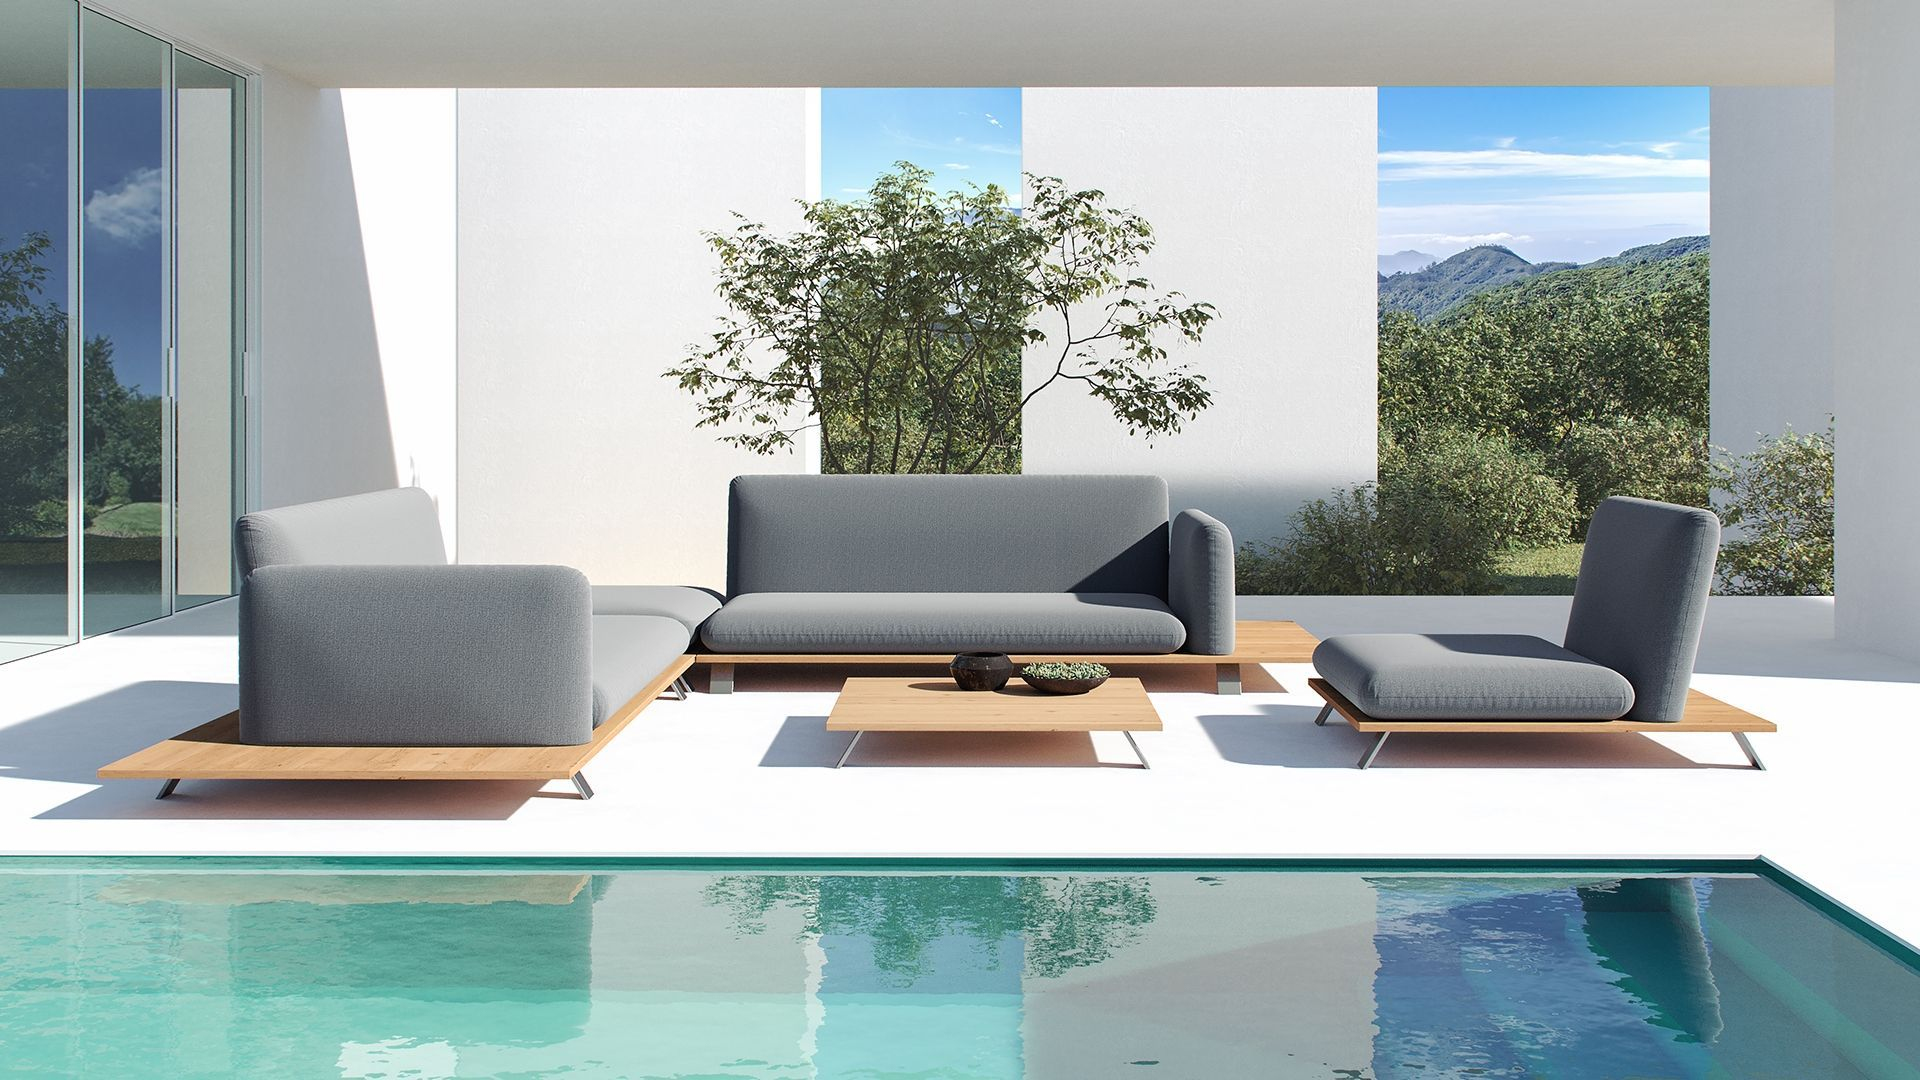 Gartenmöbel Lounge Ethna Lounge Sofa Garten Lounge Design